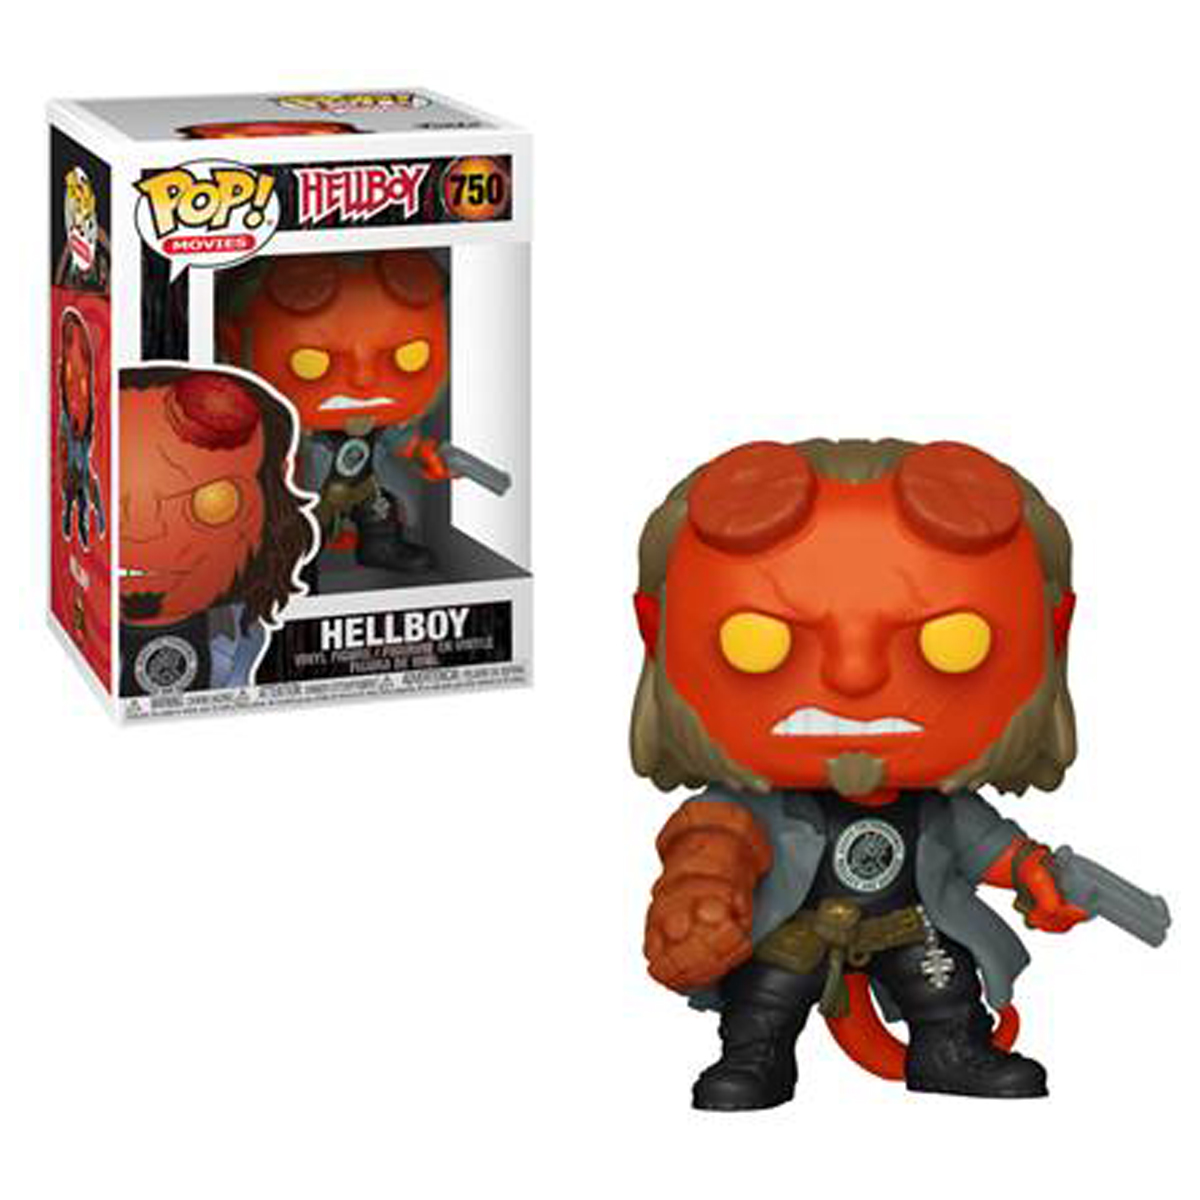 Funko POP! Movies: Hellboy - Hellboy Vinyl Figure